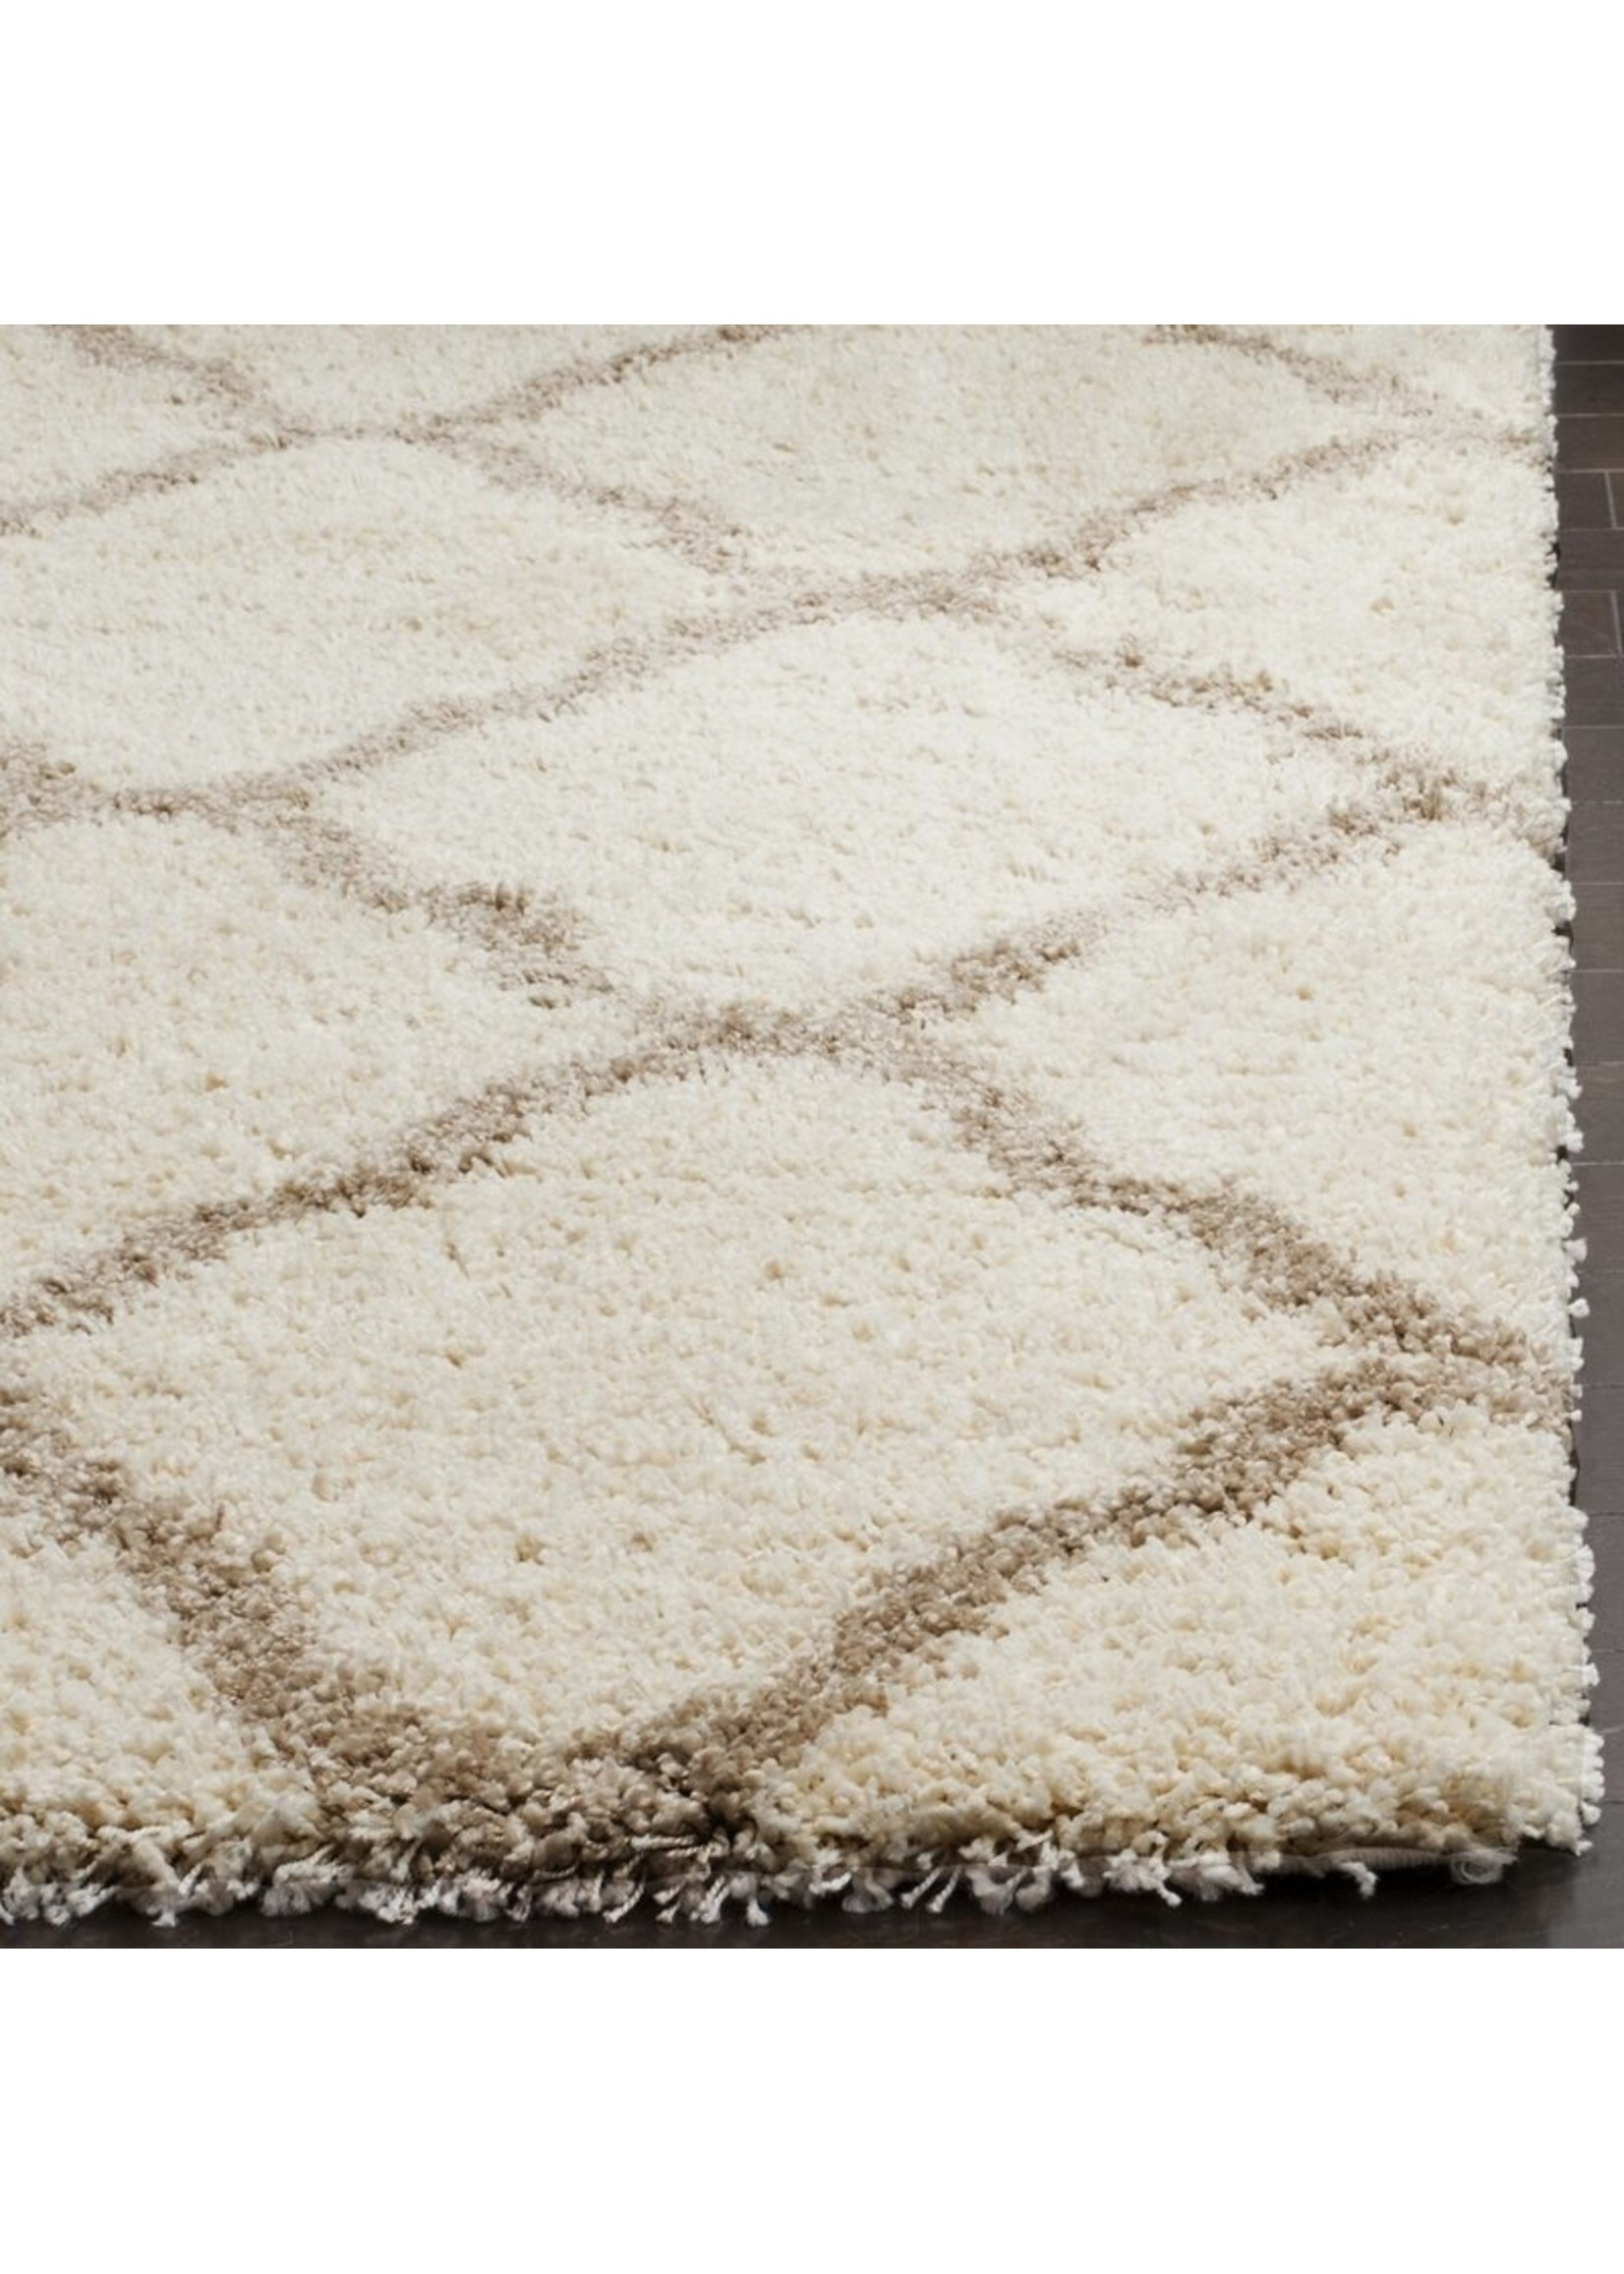 *5'3 x 7'6 - Statesboro Geometric Ivory Area Rug